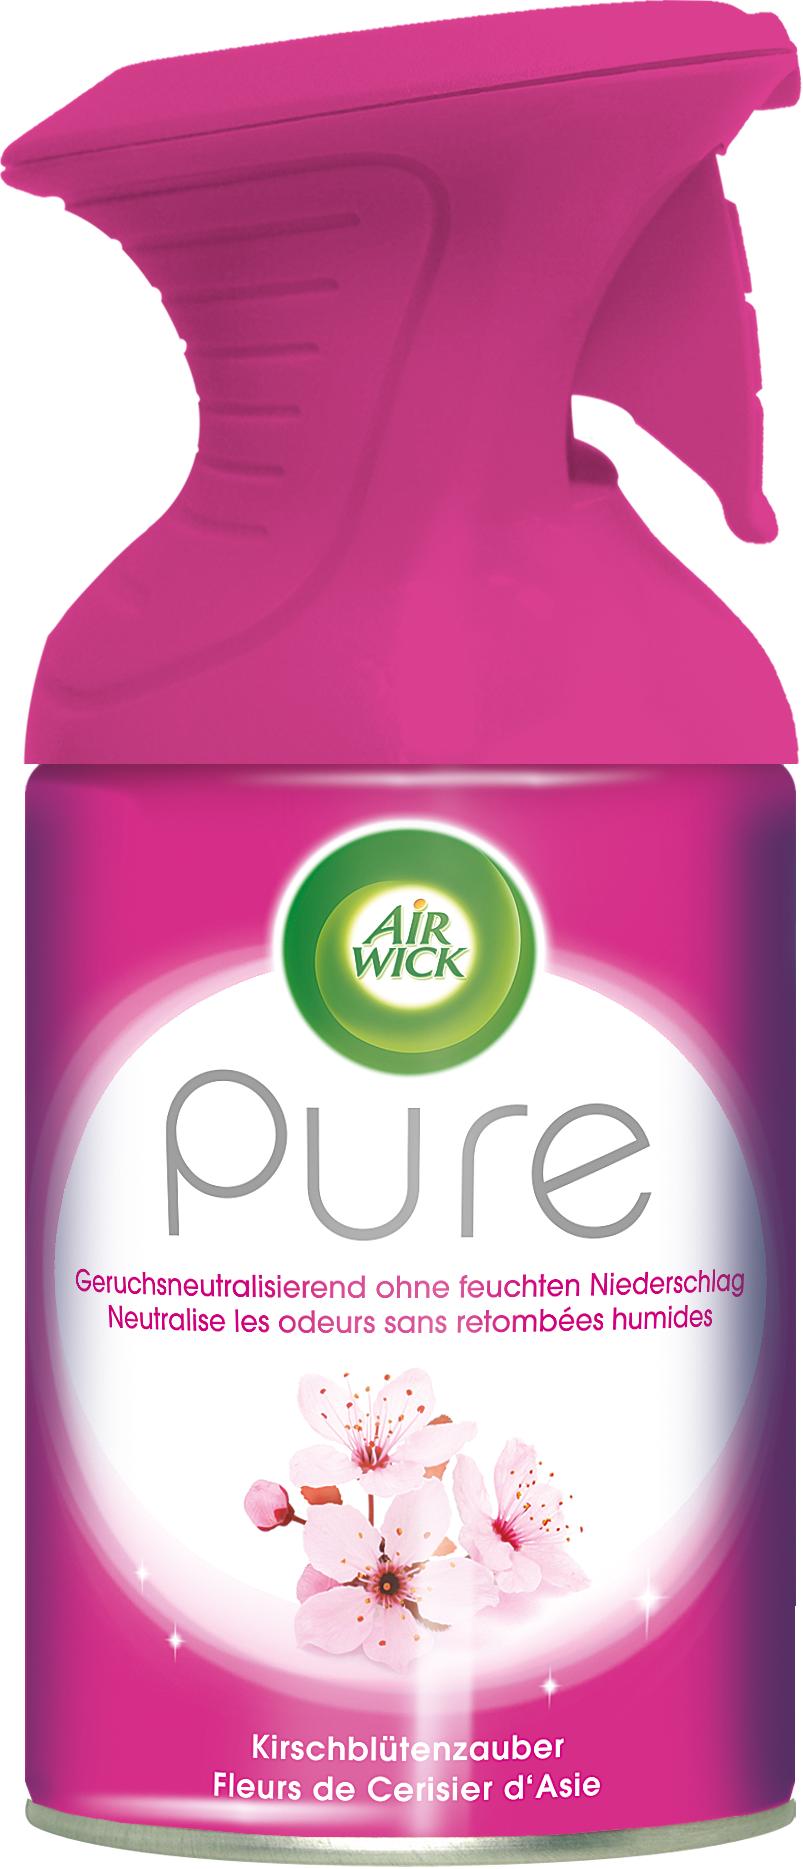 Air Wick PURE Kirschblütenzauber